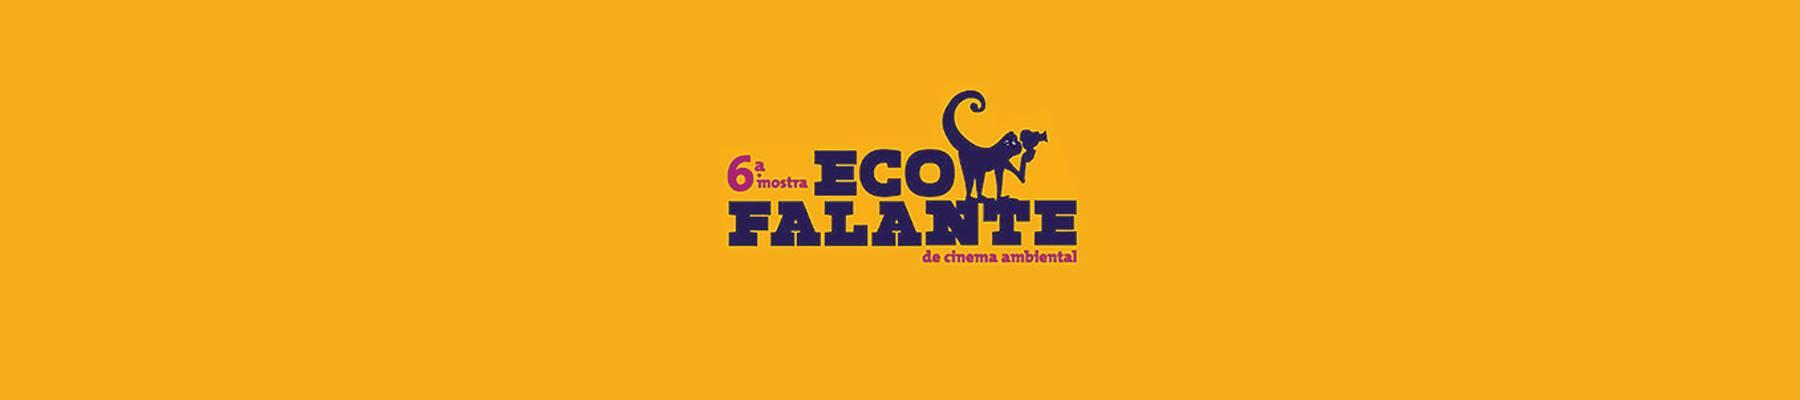 Desacelera SP participa da Mostra Ecofalante de cinema Ambiental